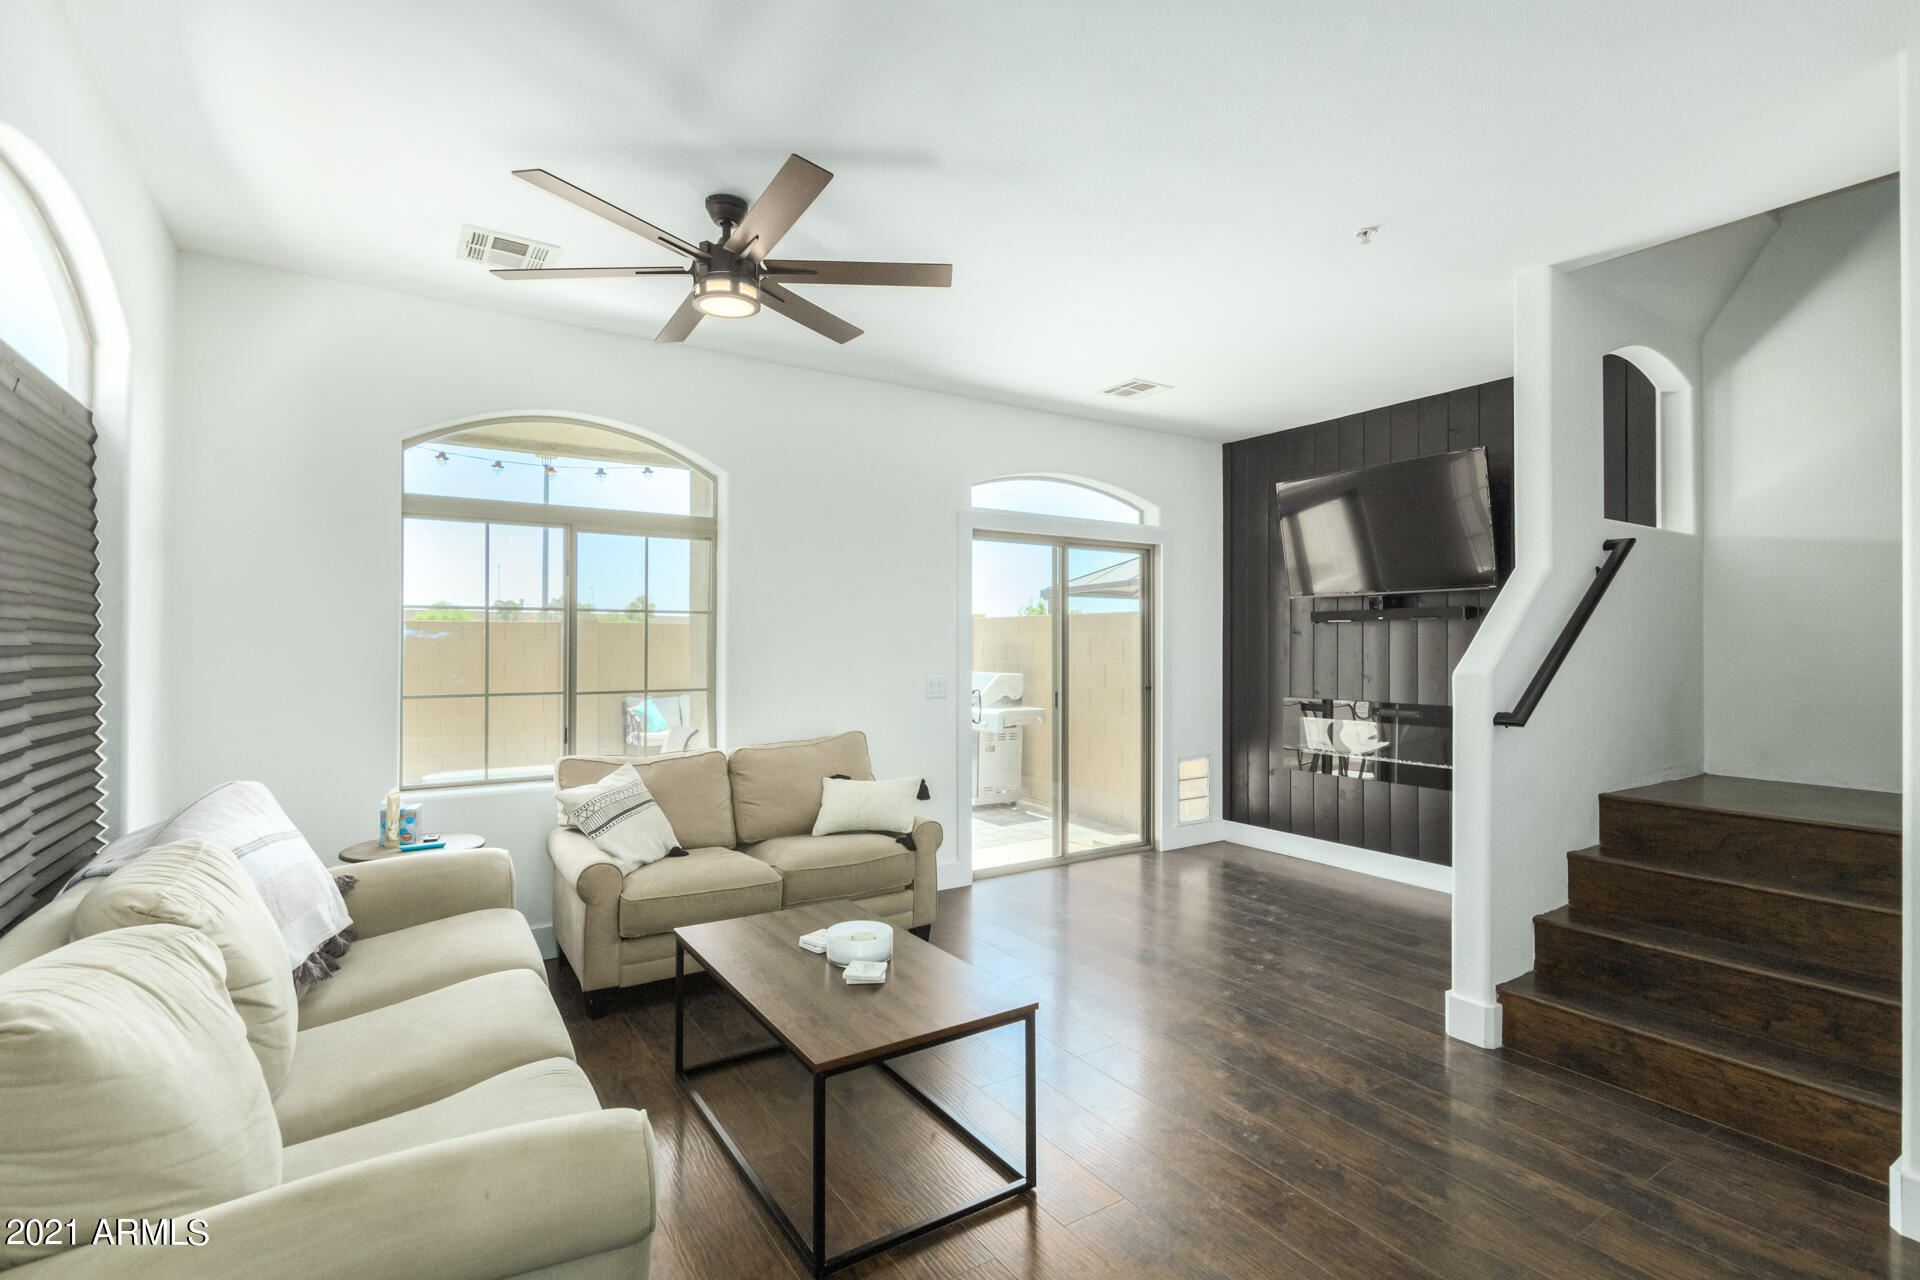 Photo of 1350 S GREENFIELD Road #1166, Mesa, AZ 85206 (MLS # 6231460)